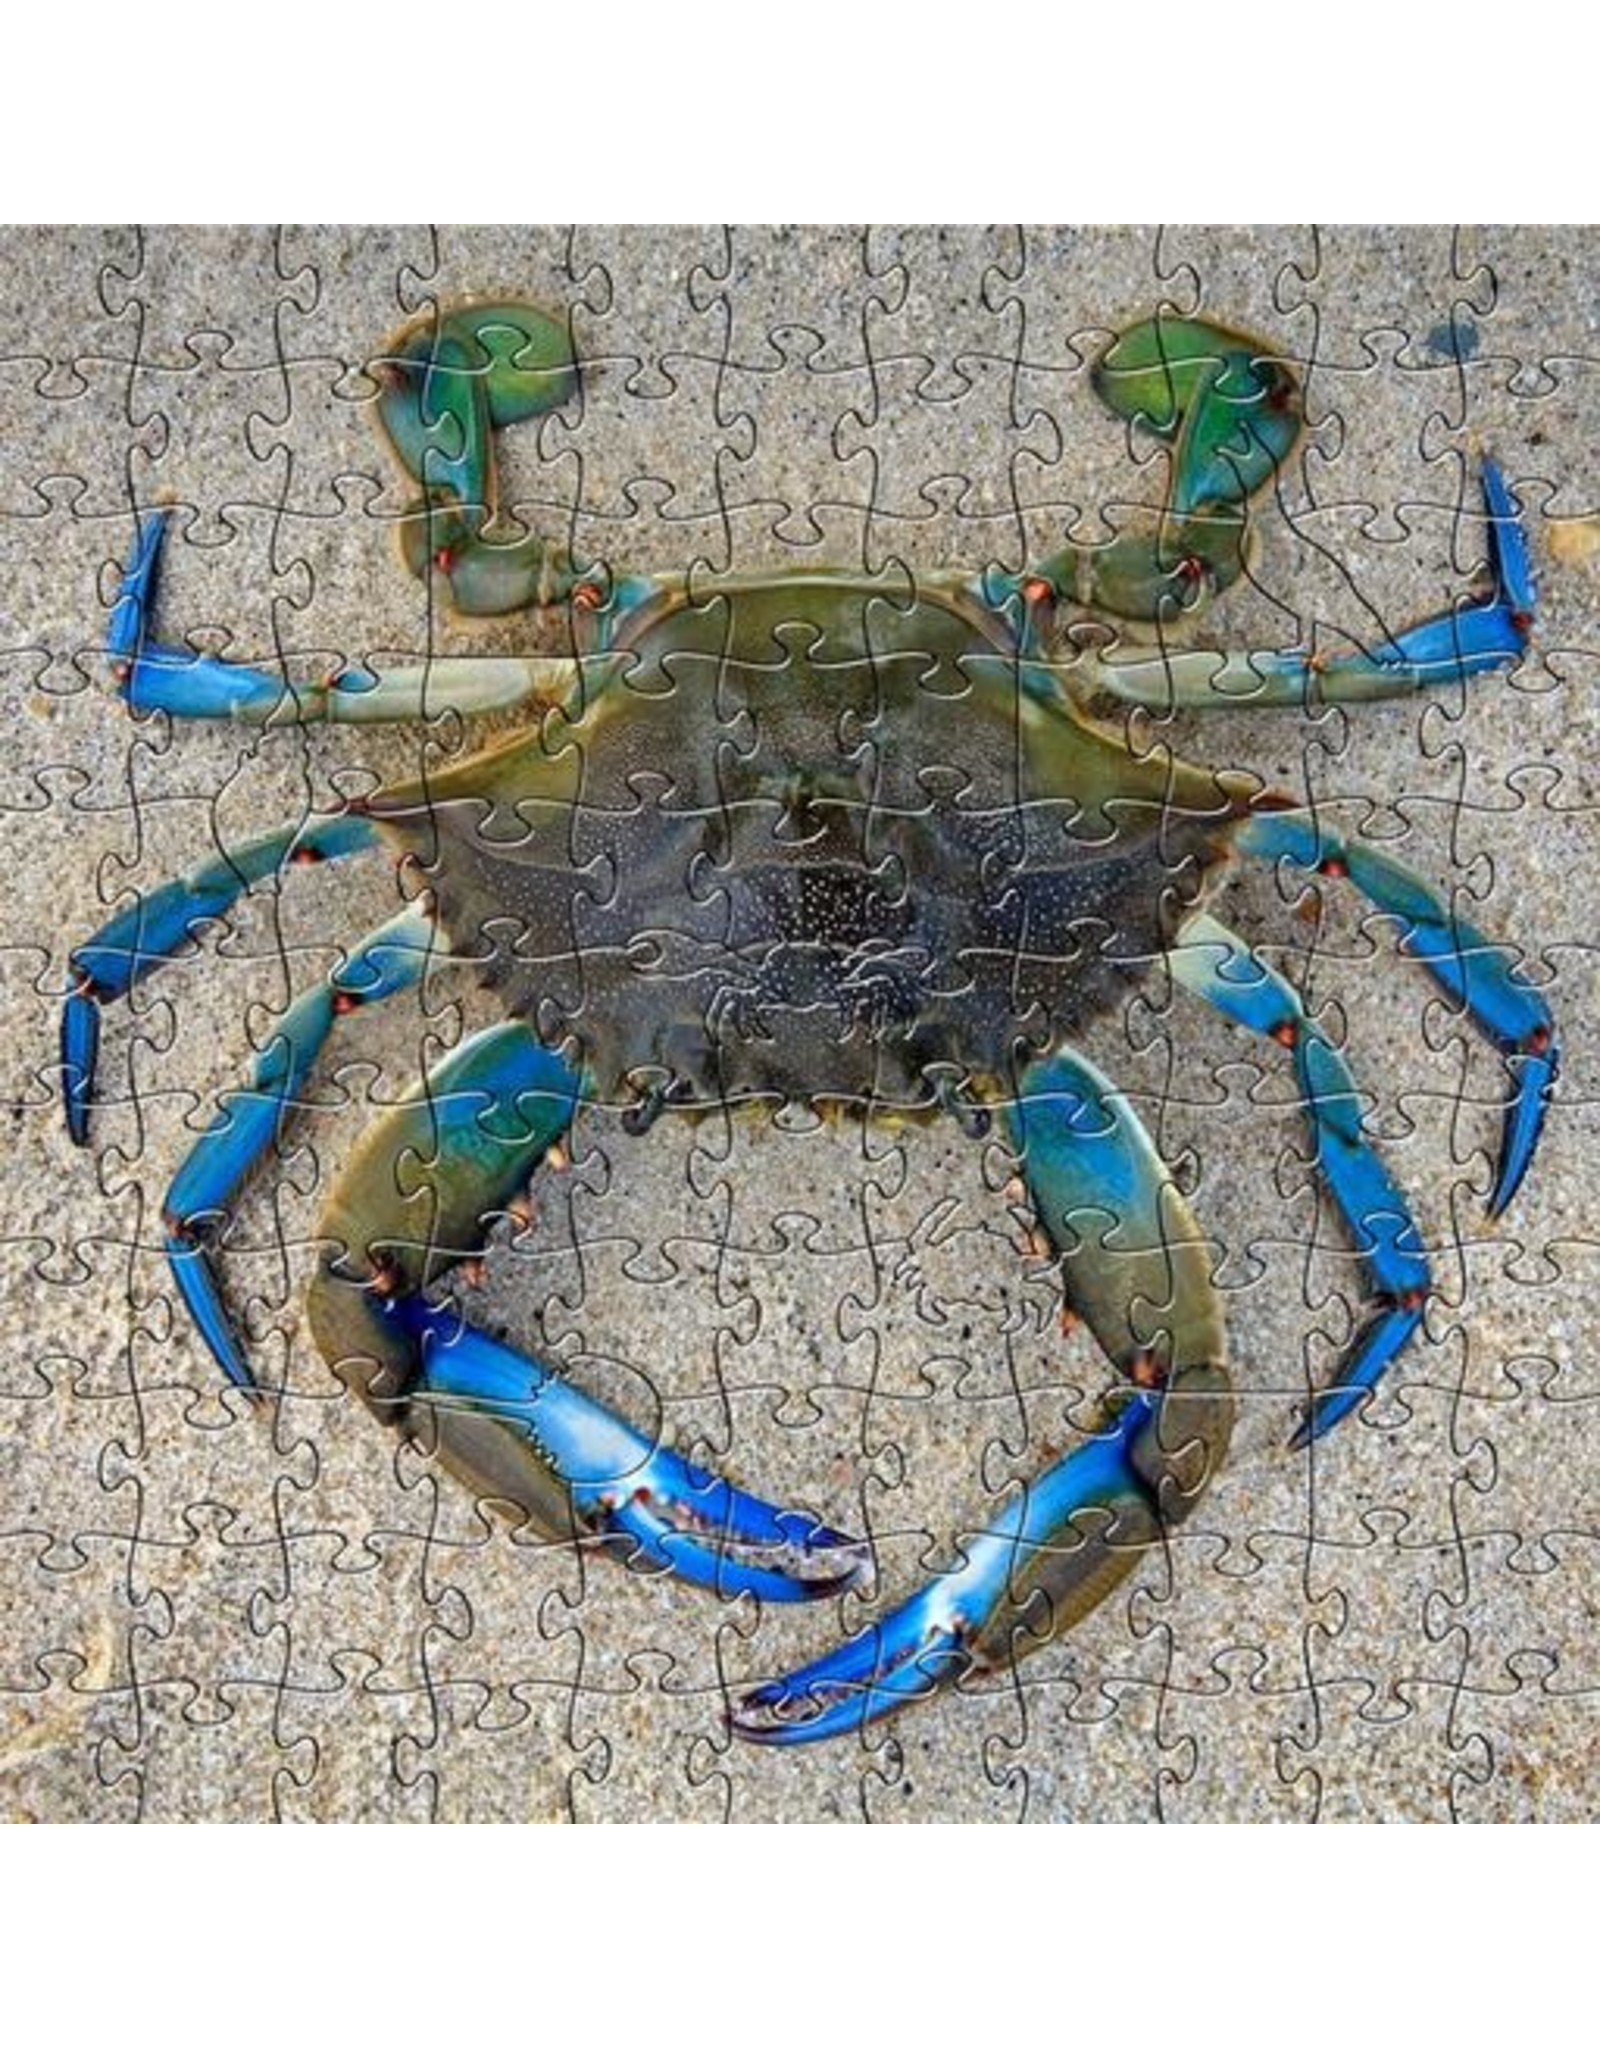 Zen Art & Design Blue Crab (Sm, 126 Pieces, Artisanal Wooden Jigsaw Puzzle)